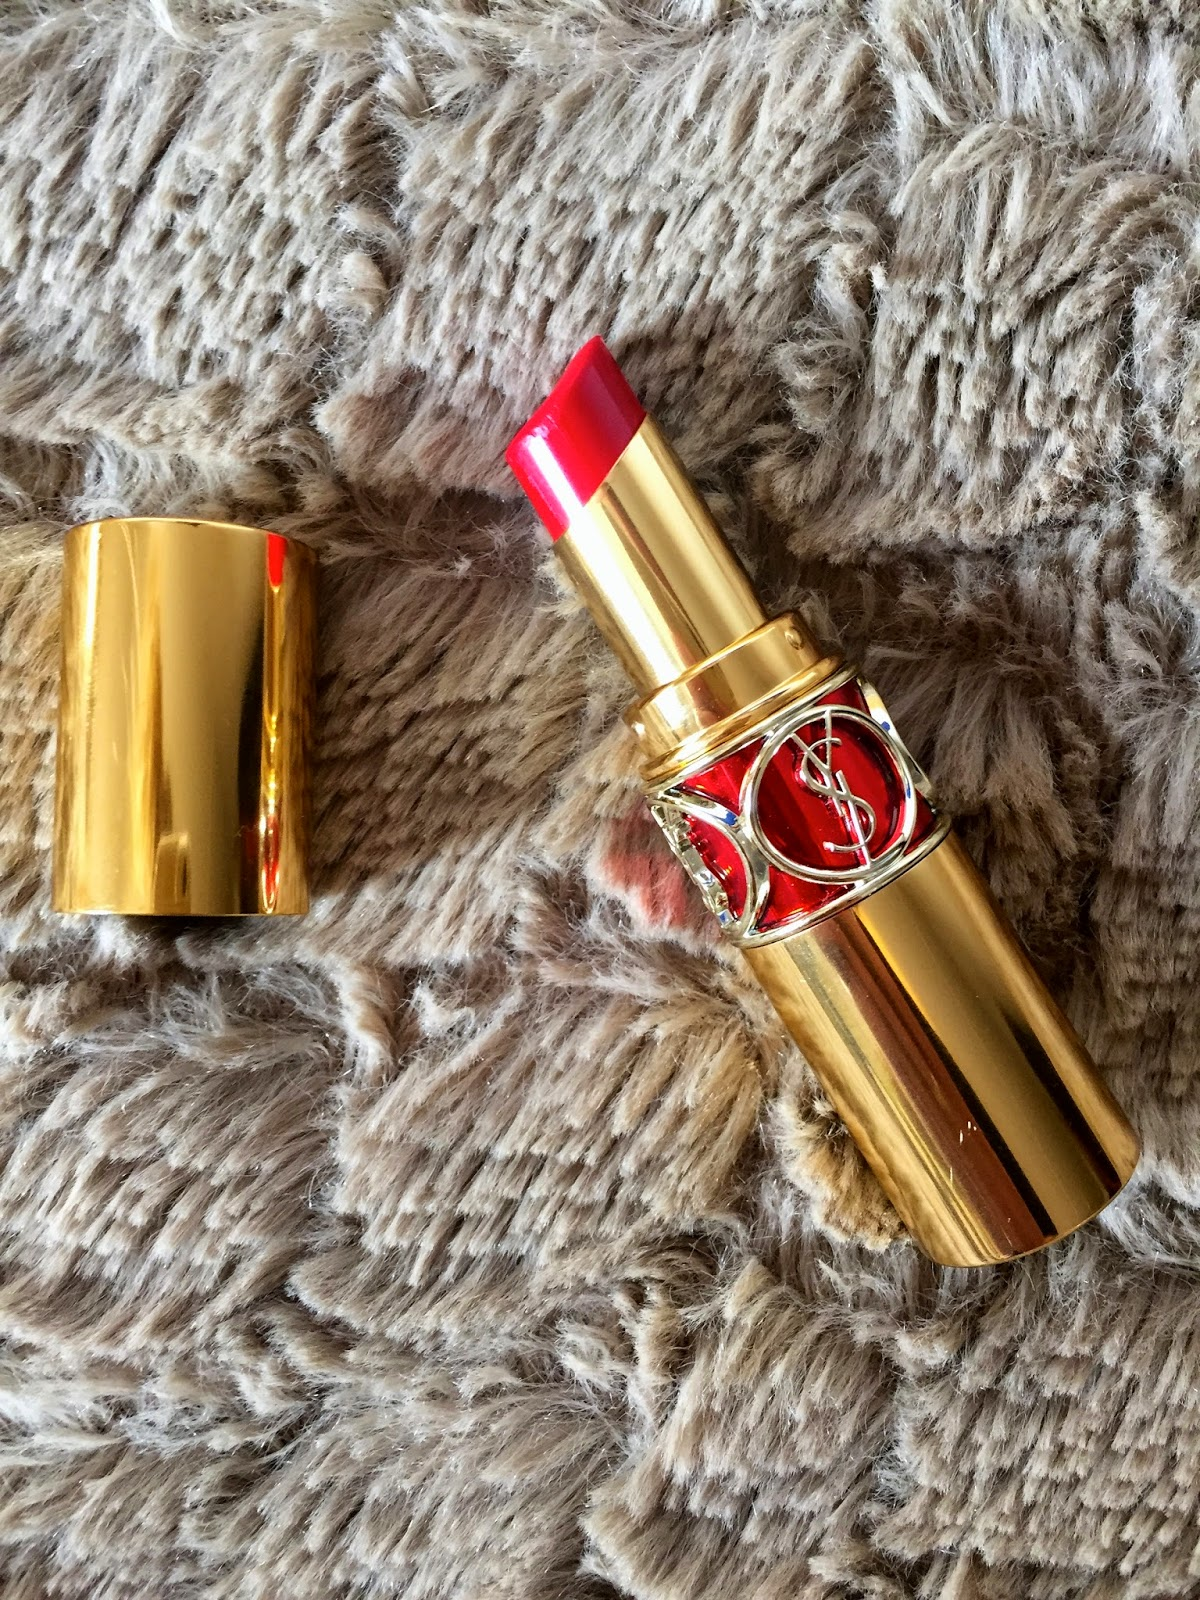 lipstick, lipstick review, ysl, ysl lipstick, ysl lipstick review, yves saint laurent rouge volupte shine, rouge in danger,